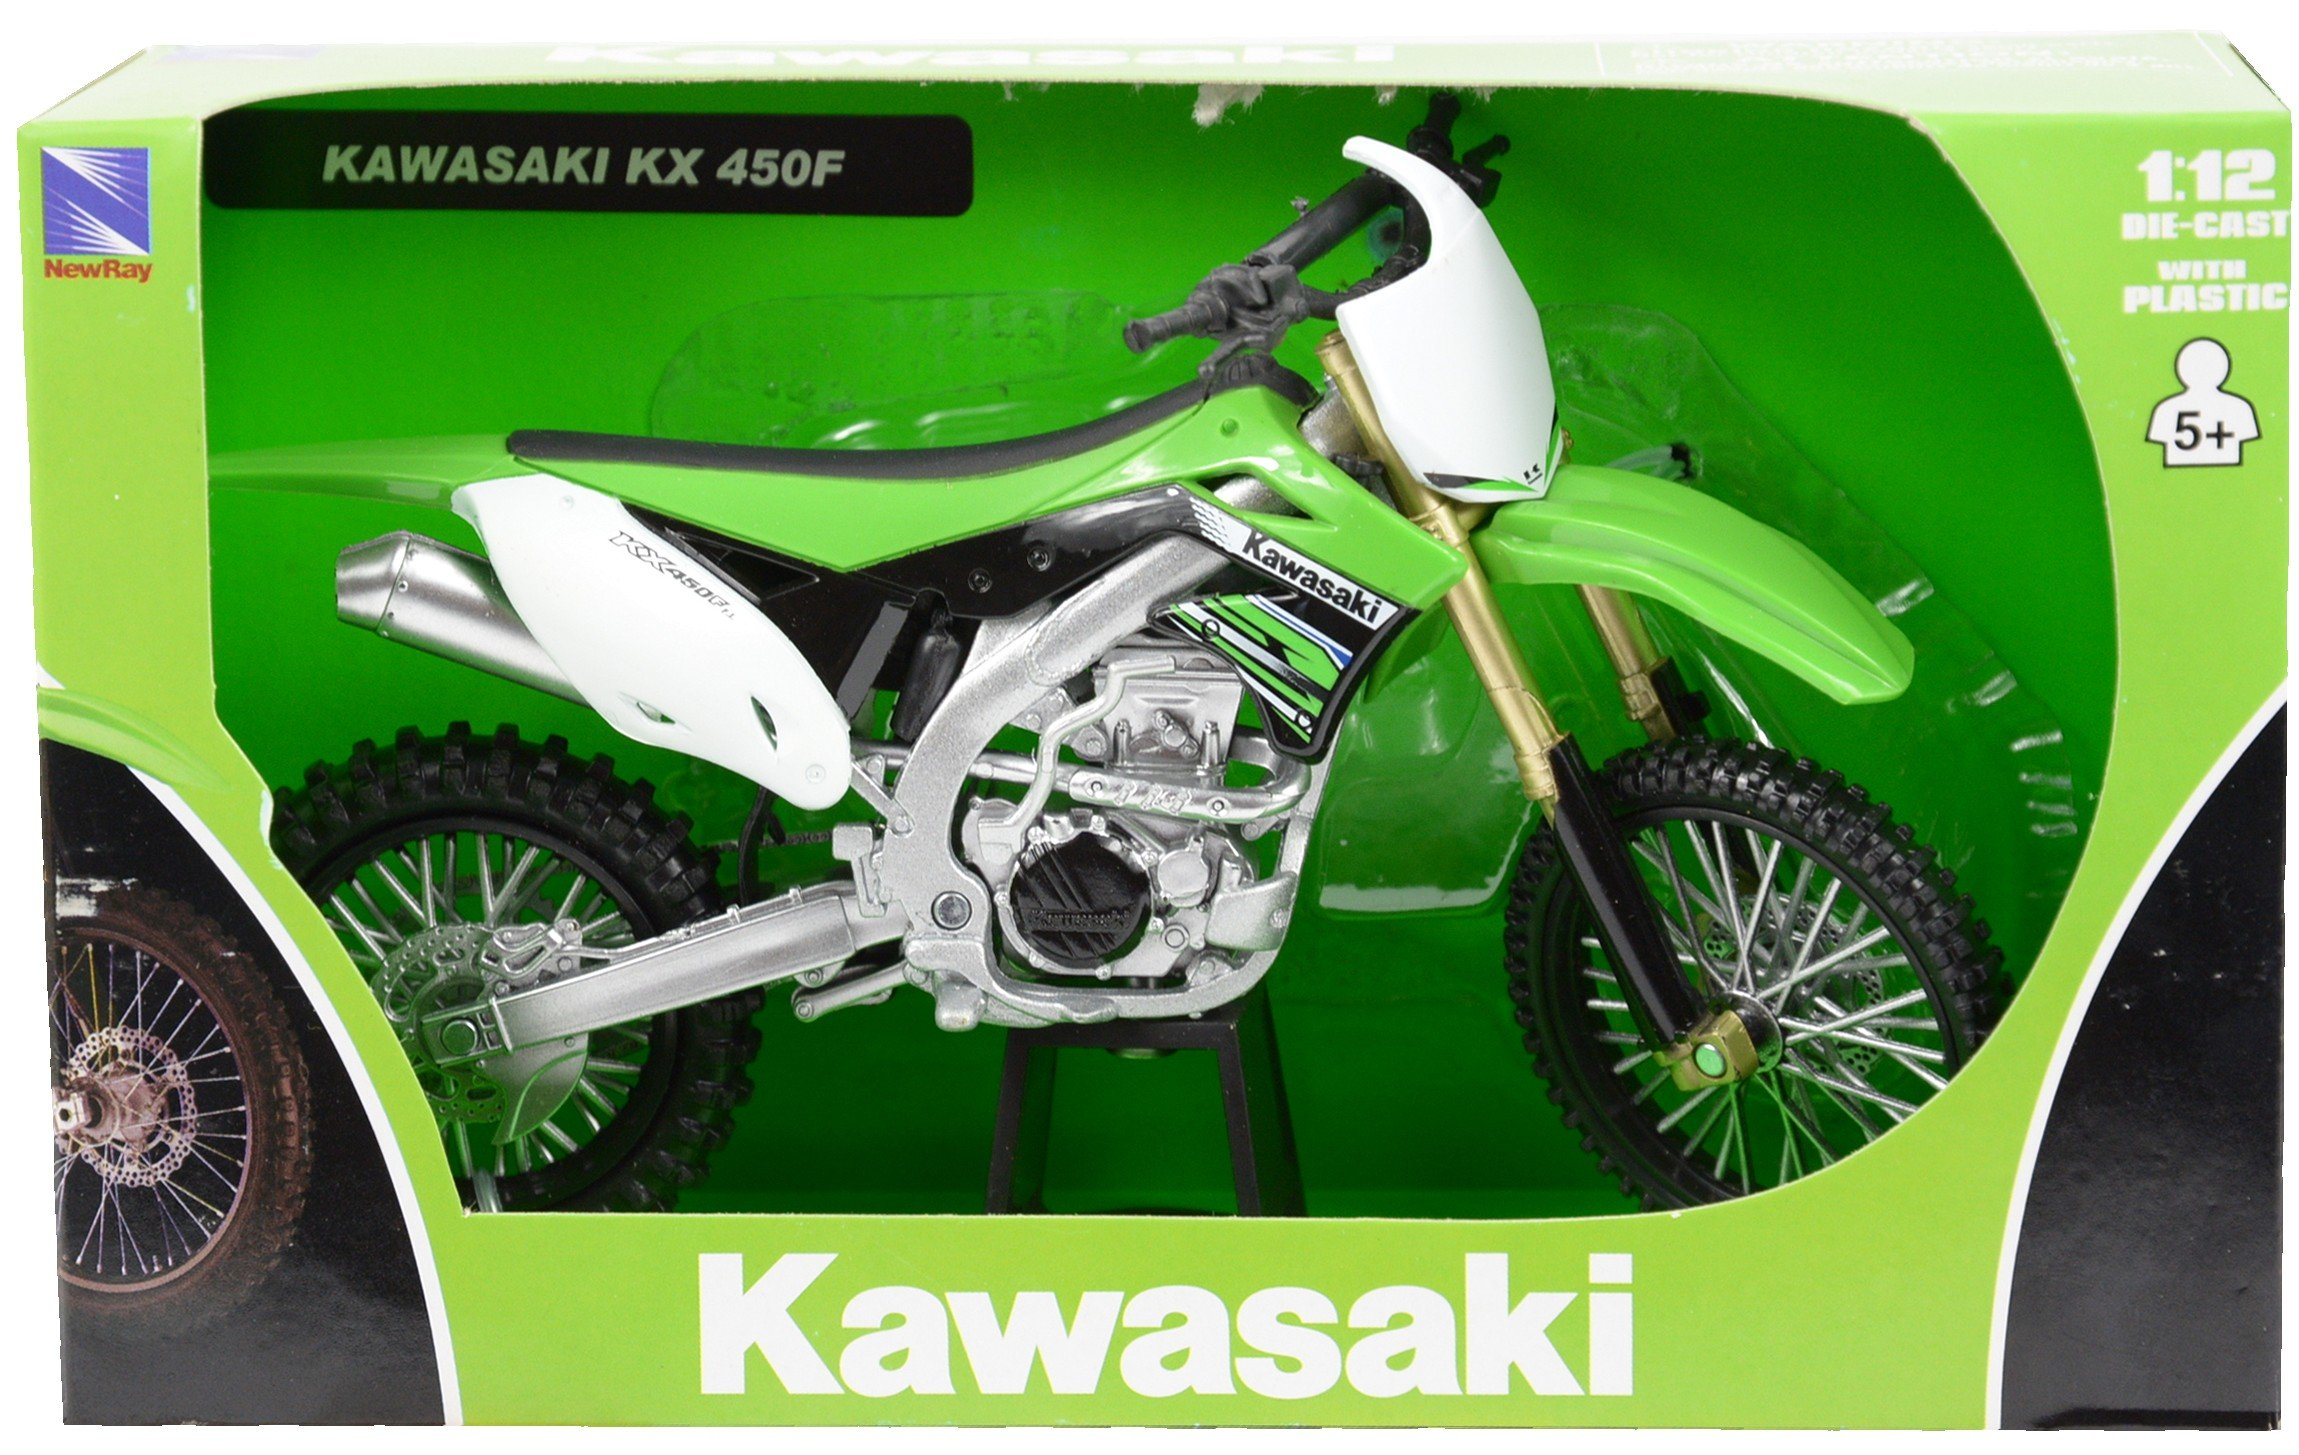 NewRay 1:12 2012 Kawasaki Kf450F Dirty Bike Diecast Vehicle